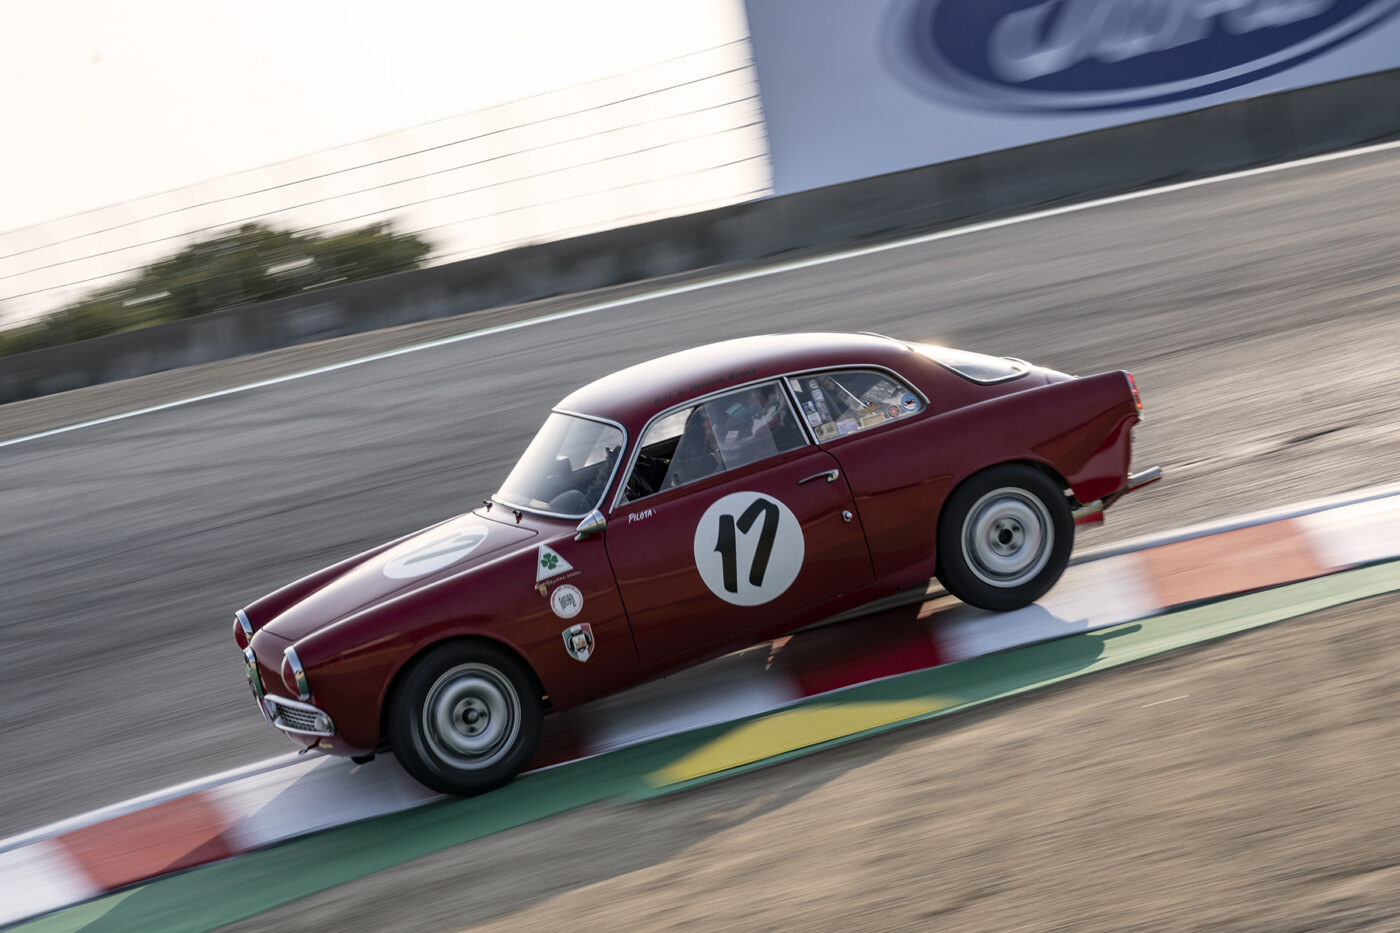 Patrick Byrne's quick 1958 Alfa Romeo Guilietta 1300 Sprint Veloce 1300 dives into the Corkscrew Saturday morning. ©2021 Dennis Gray